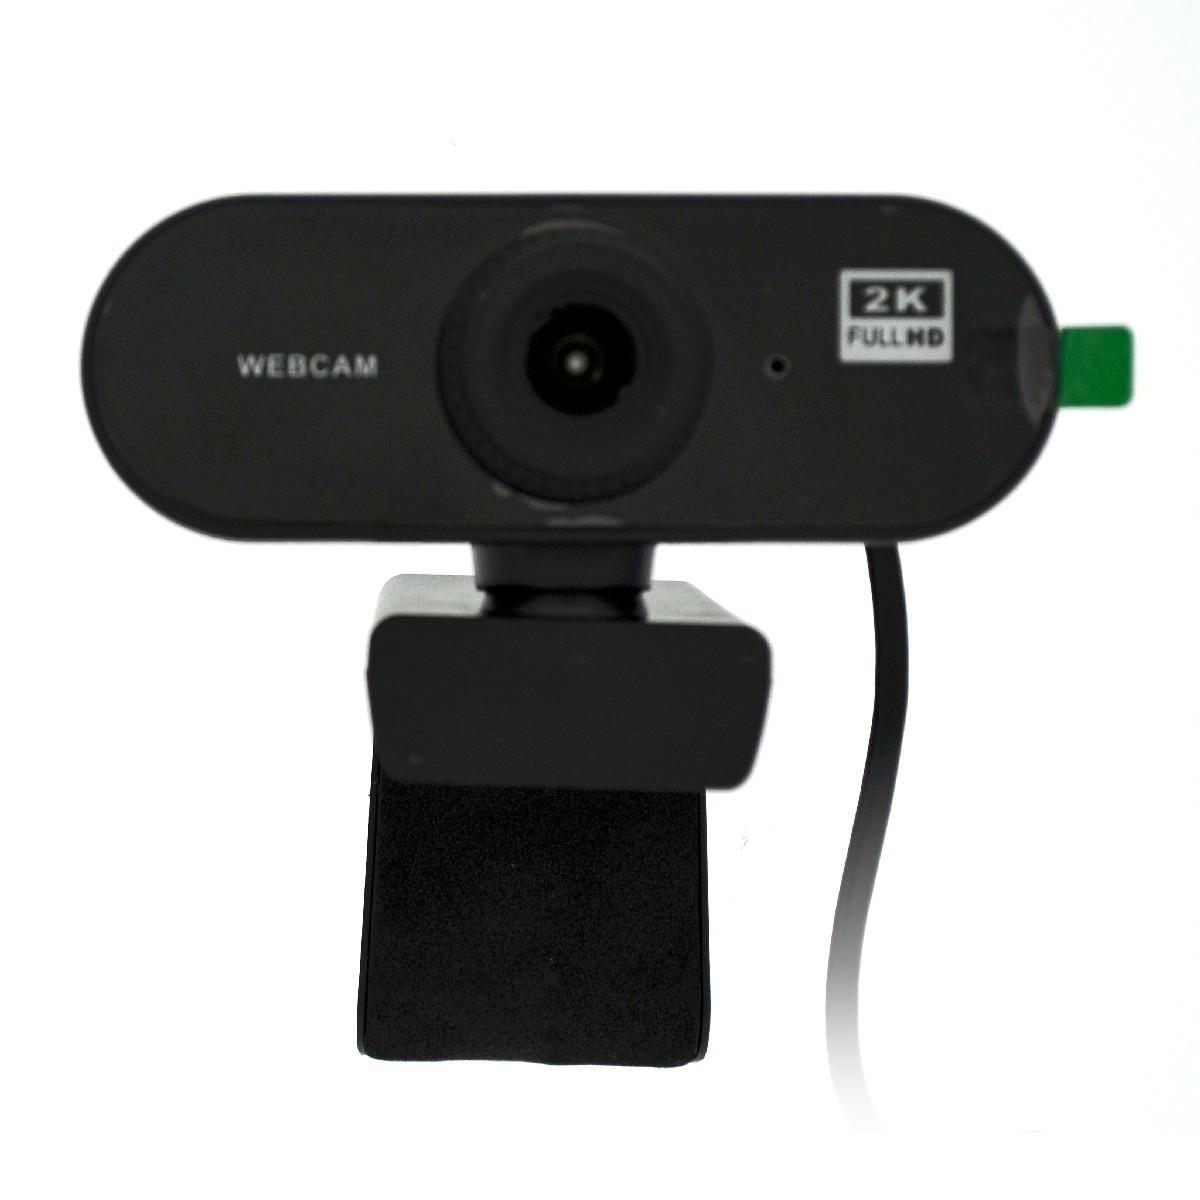 USB Webcam Mobilis PC01-2 Full HD 1080P 2560X1440 με Ενσωματωμένο Μικρόφωνο και Εστίαση 20mm. Μαύρη